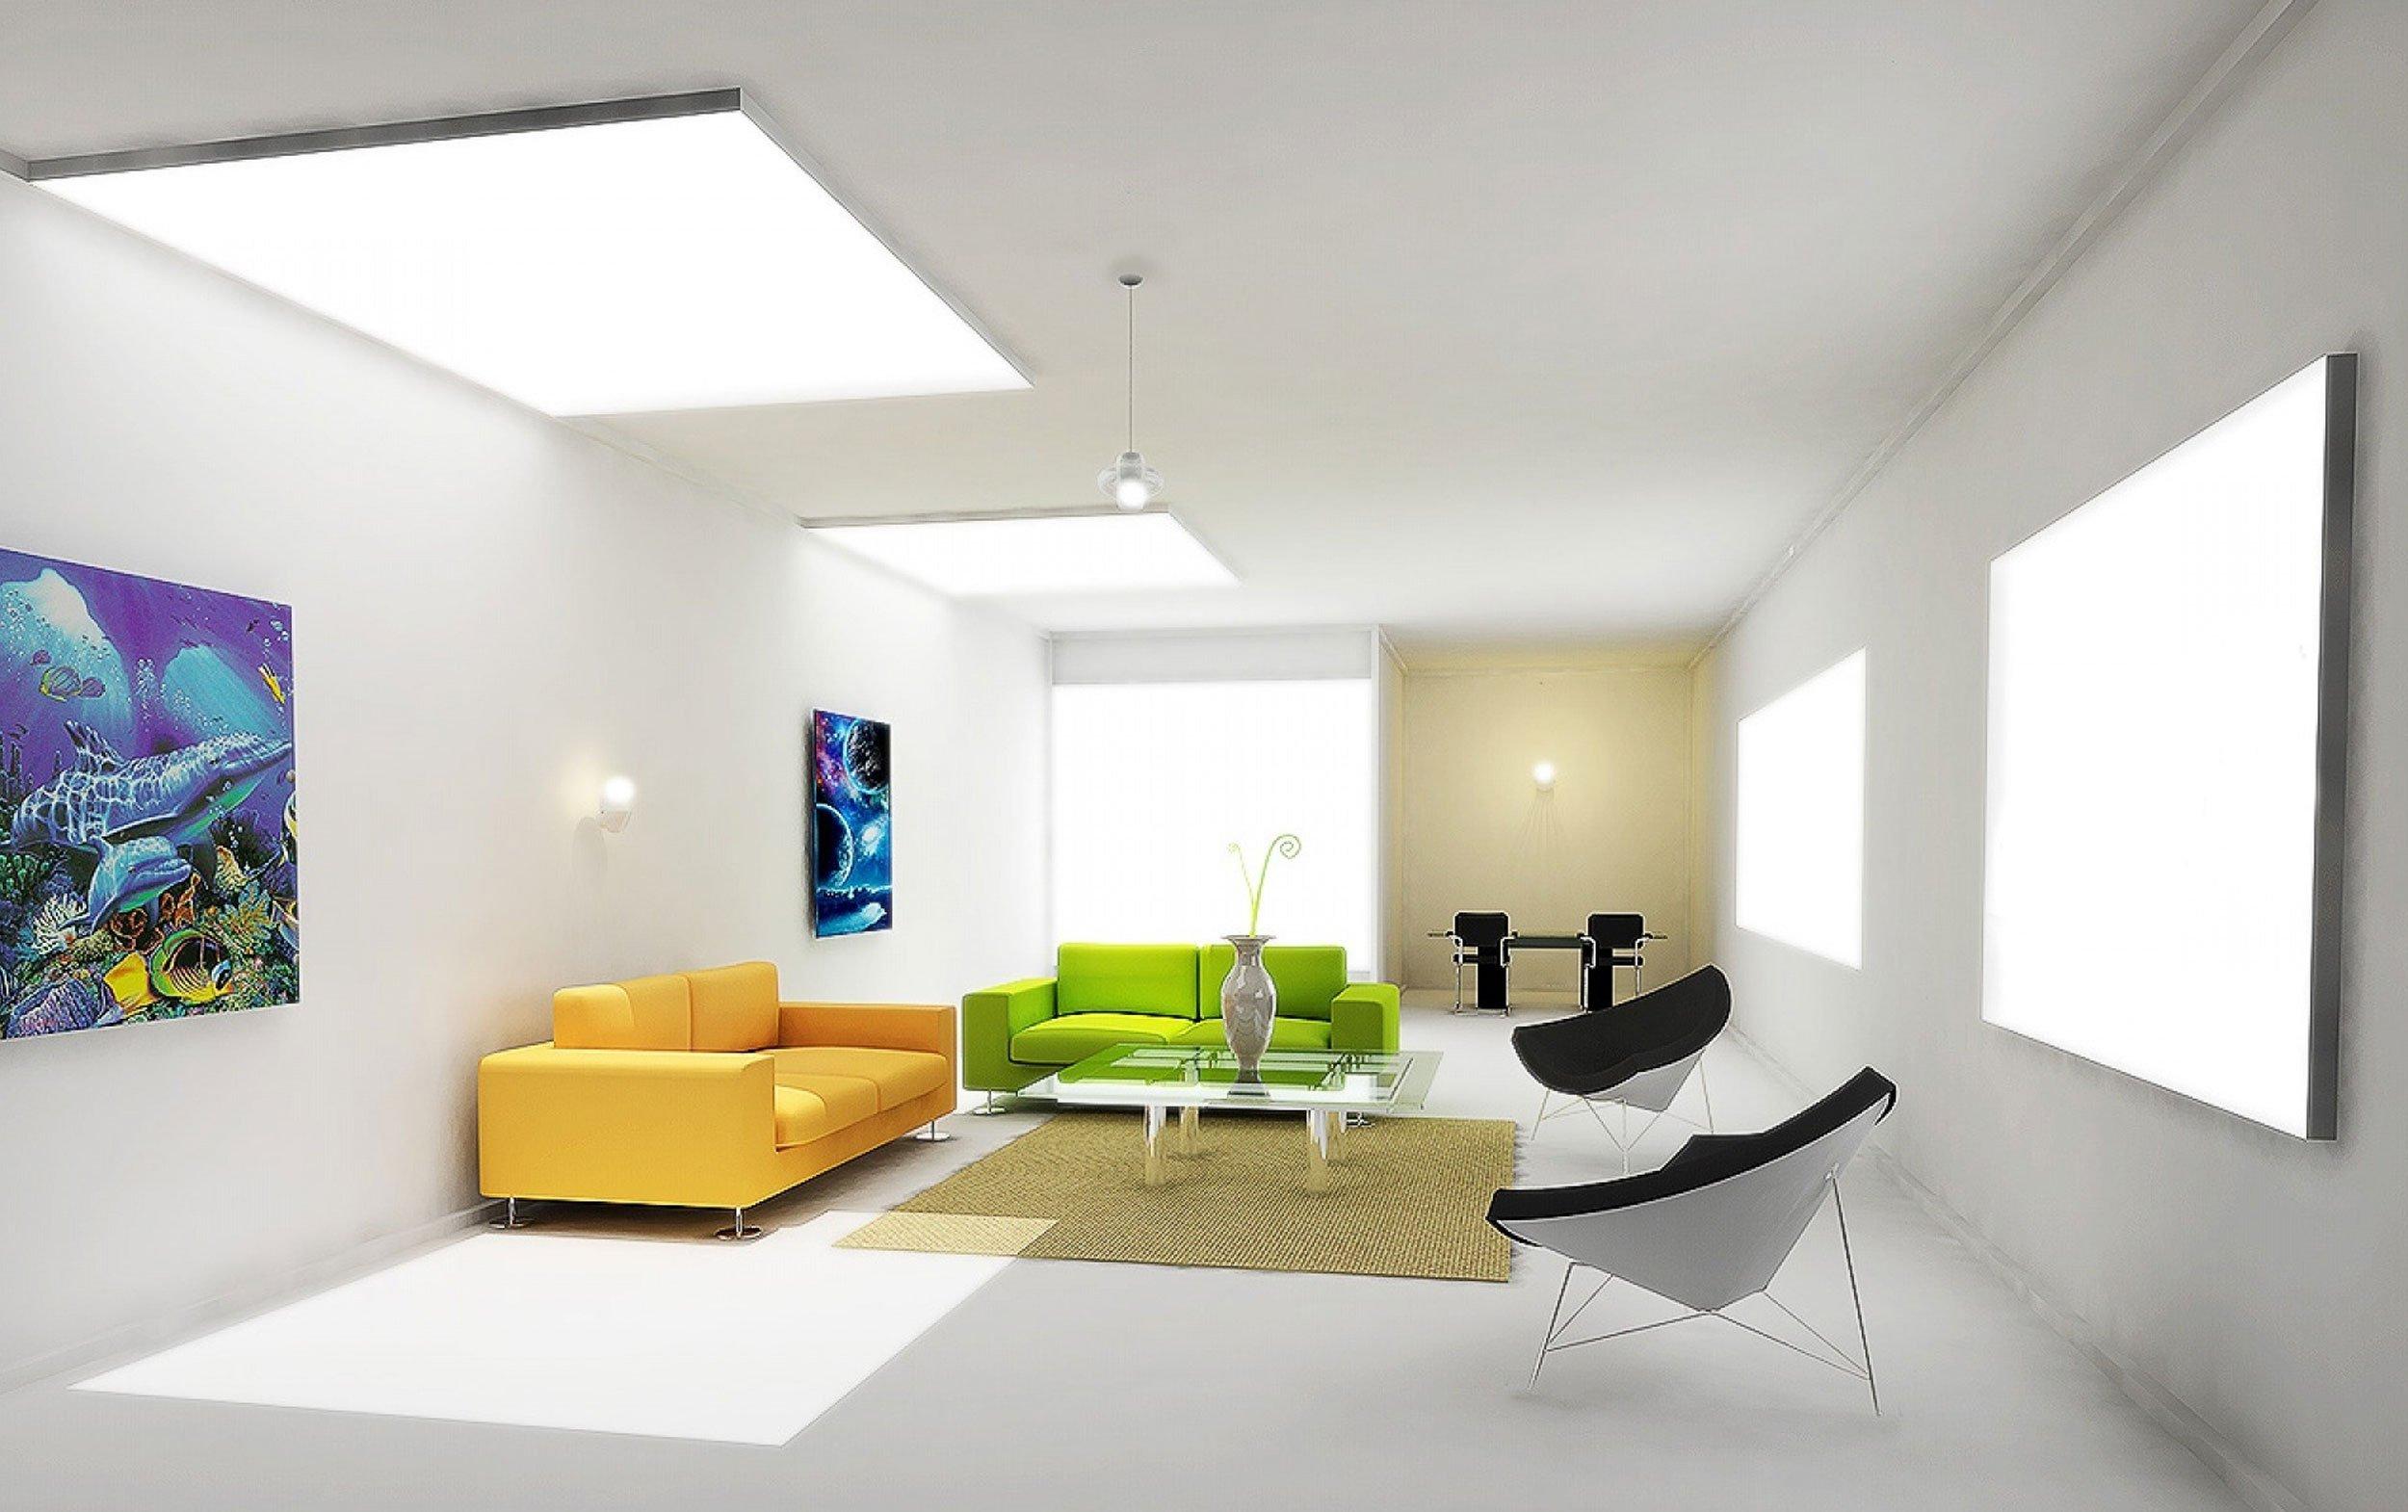 Apartment Condominium Condo Interior Design Room House Post Modern House Interior 2500x1570 Download Hd Wallpaper Wallpapertip